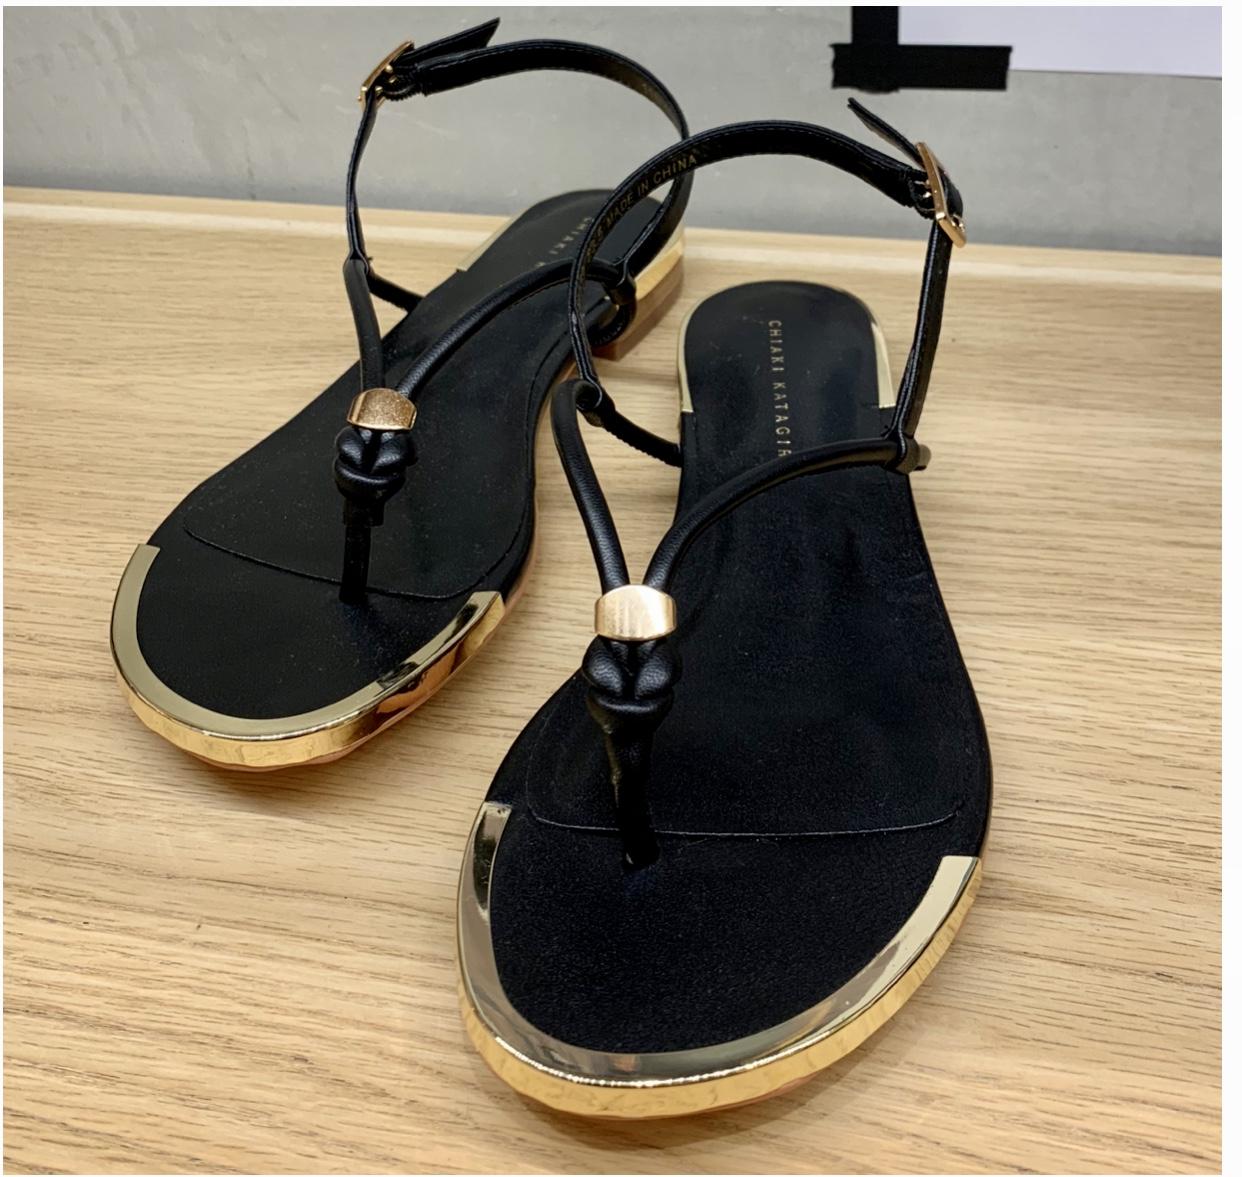 Scrap Book スクラップブック チアキカタギリ 日本ブランド サンダル sandals 細ストラップサンダル ゴールド金具 インソールクッション トングサンダル